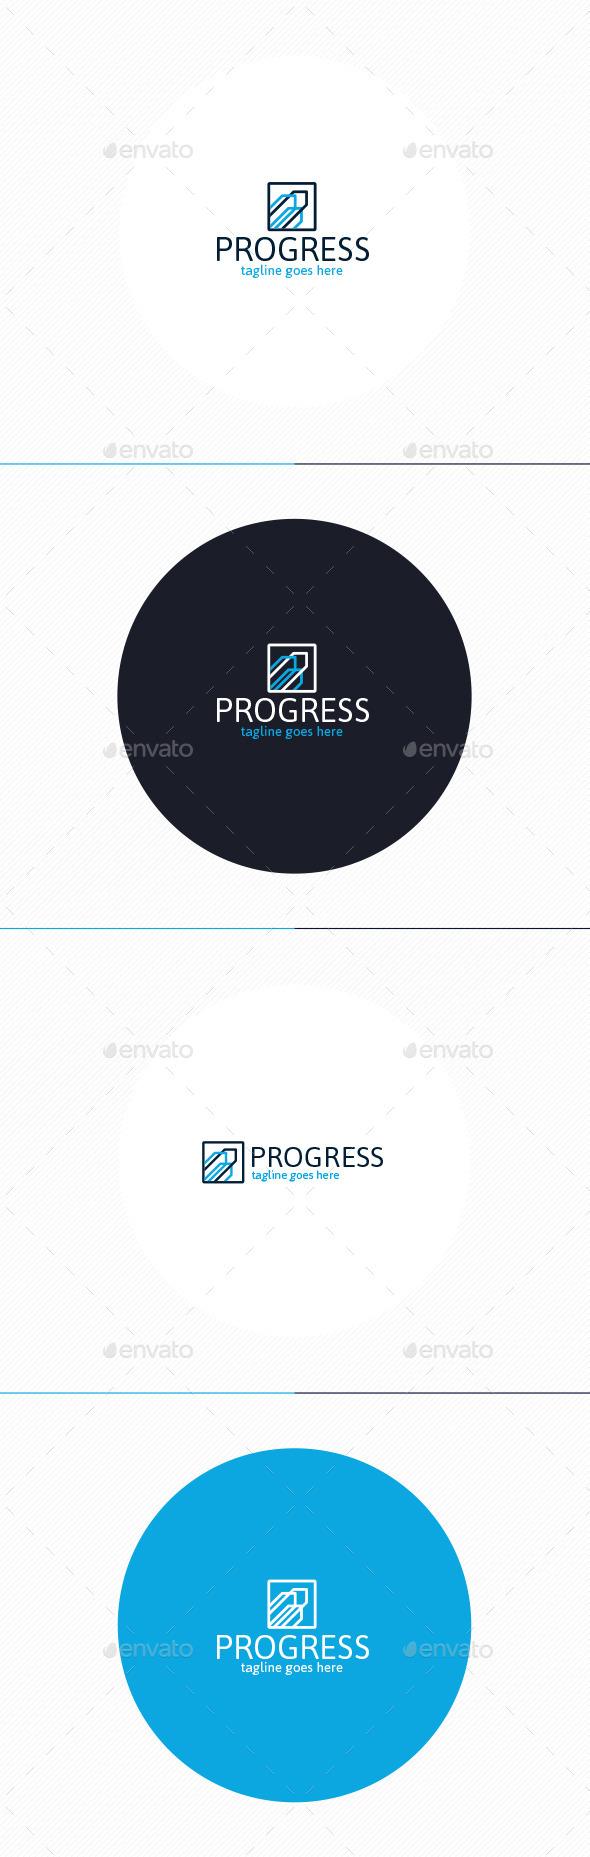 Progress Logo - Vector Abstract